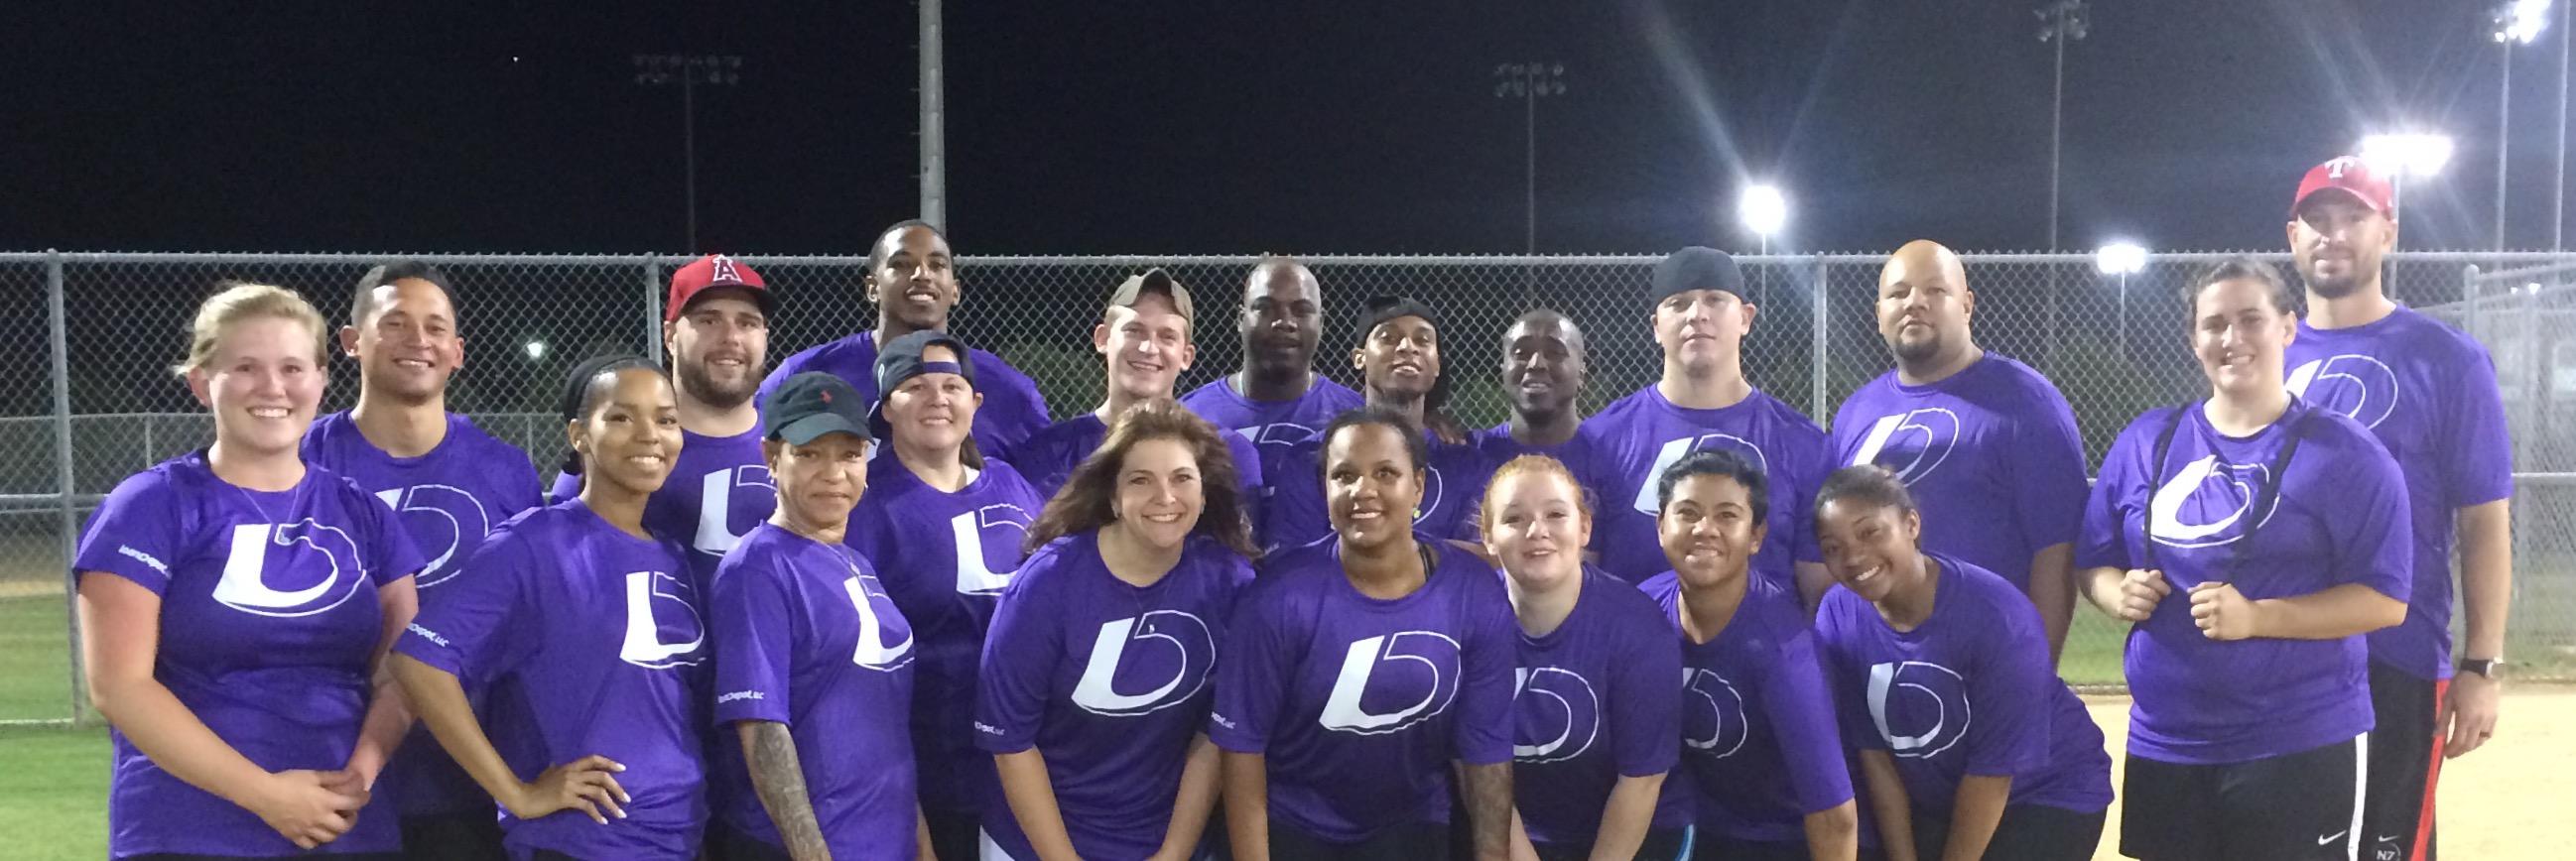 plano-softball-league